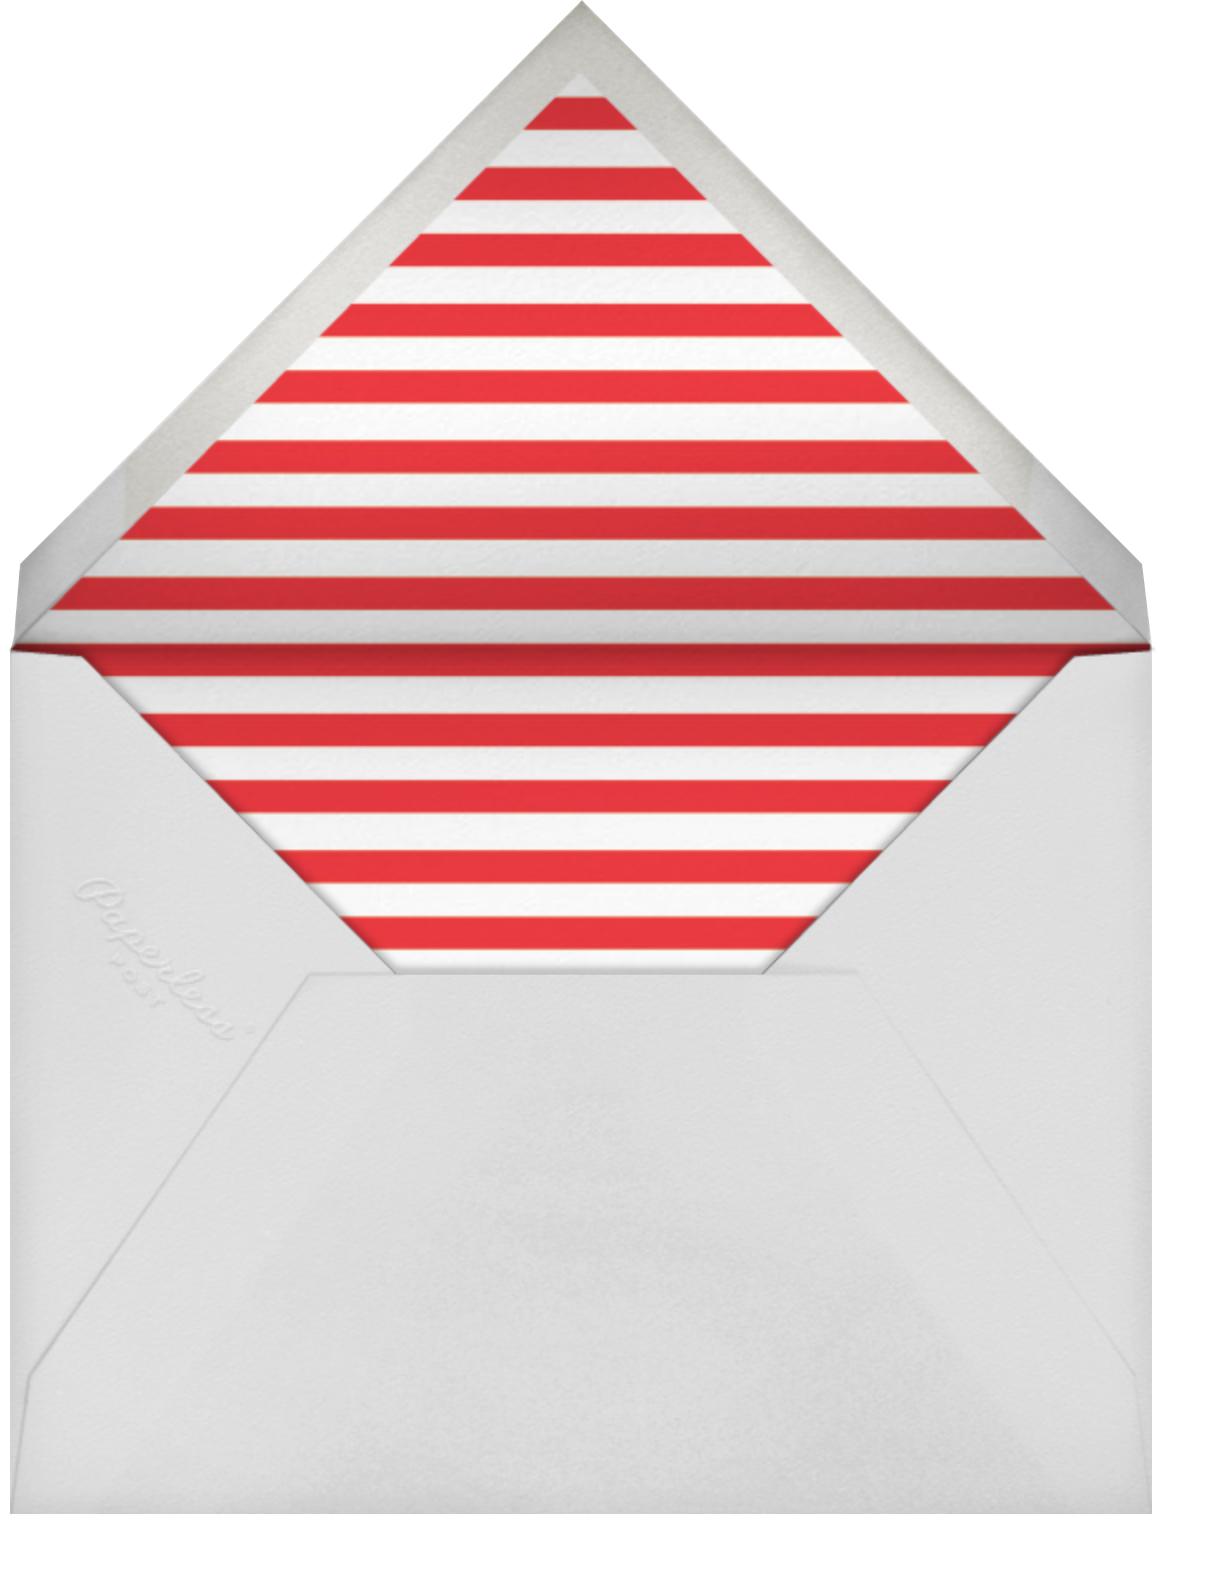 What A Sweetie - Mr. Boddington's Studio - Envelope